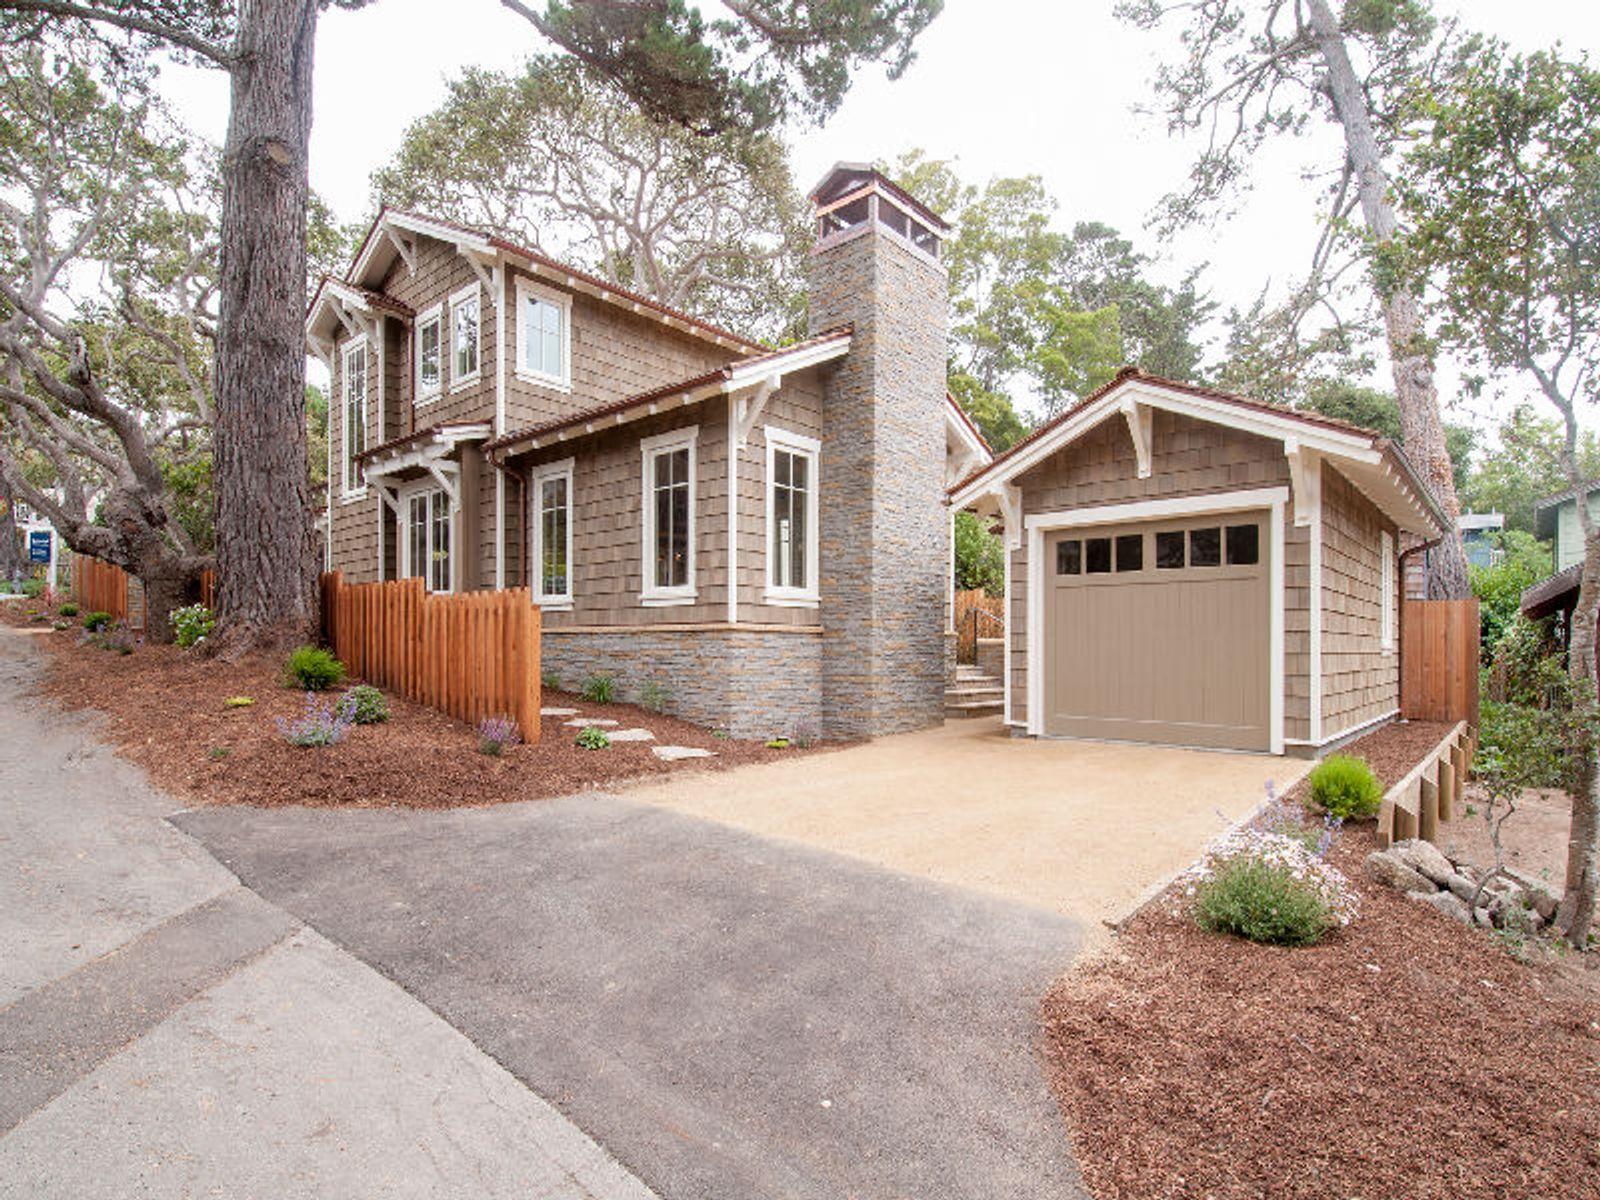 New Carmel Cottage Charm